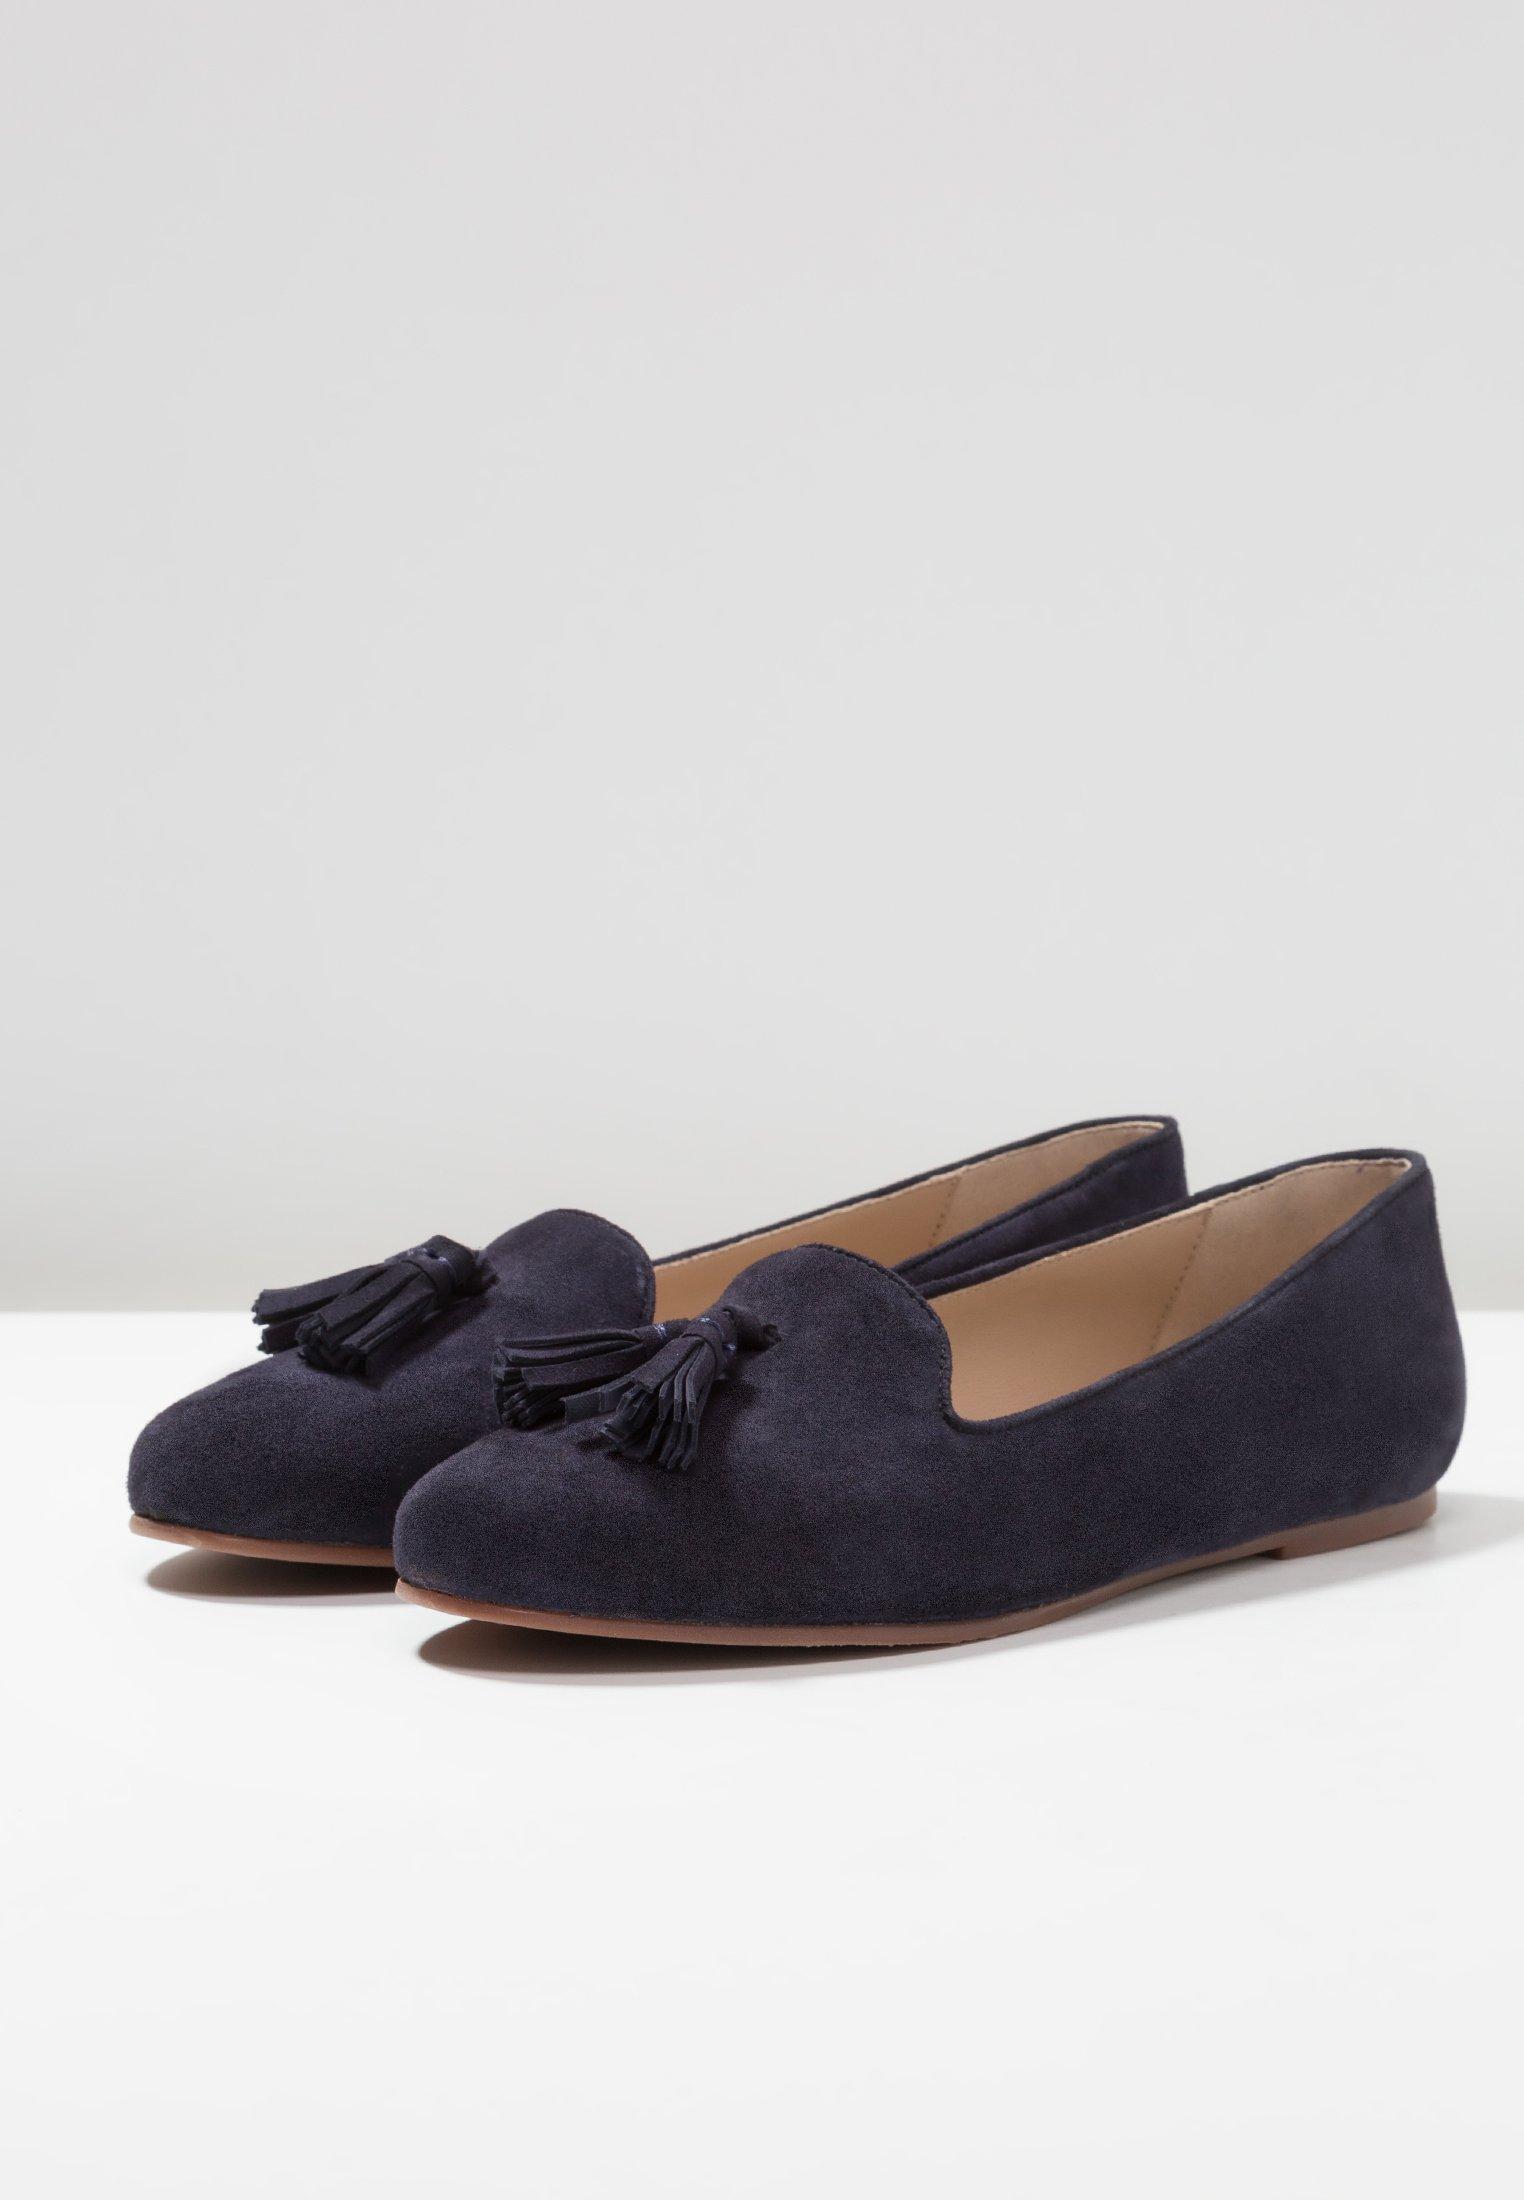 mint&berry Loafers - dark blue